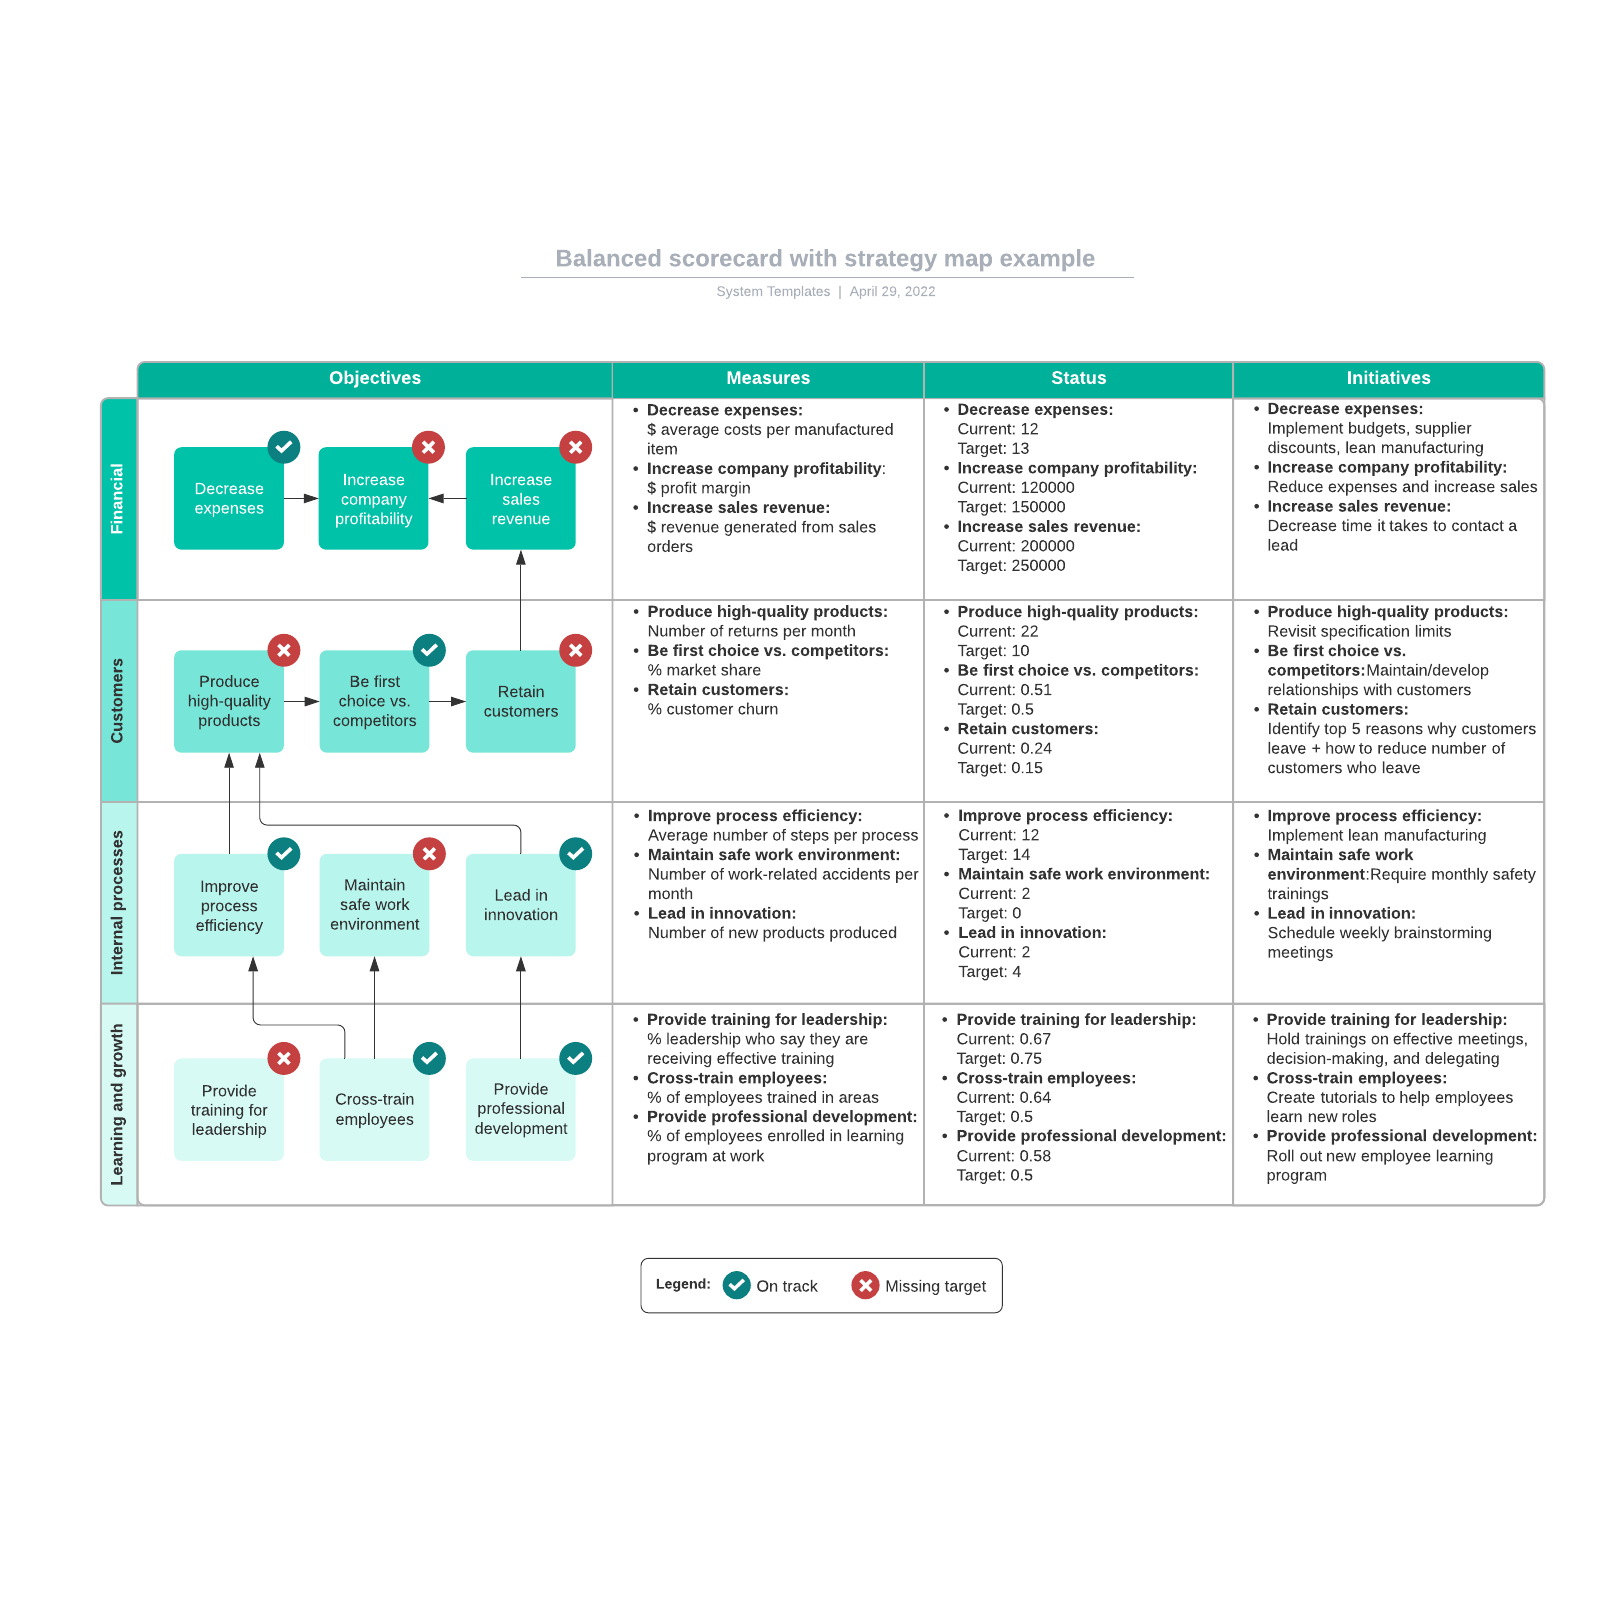 Balanced scorecard with strategy map example